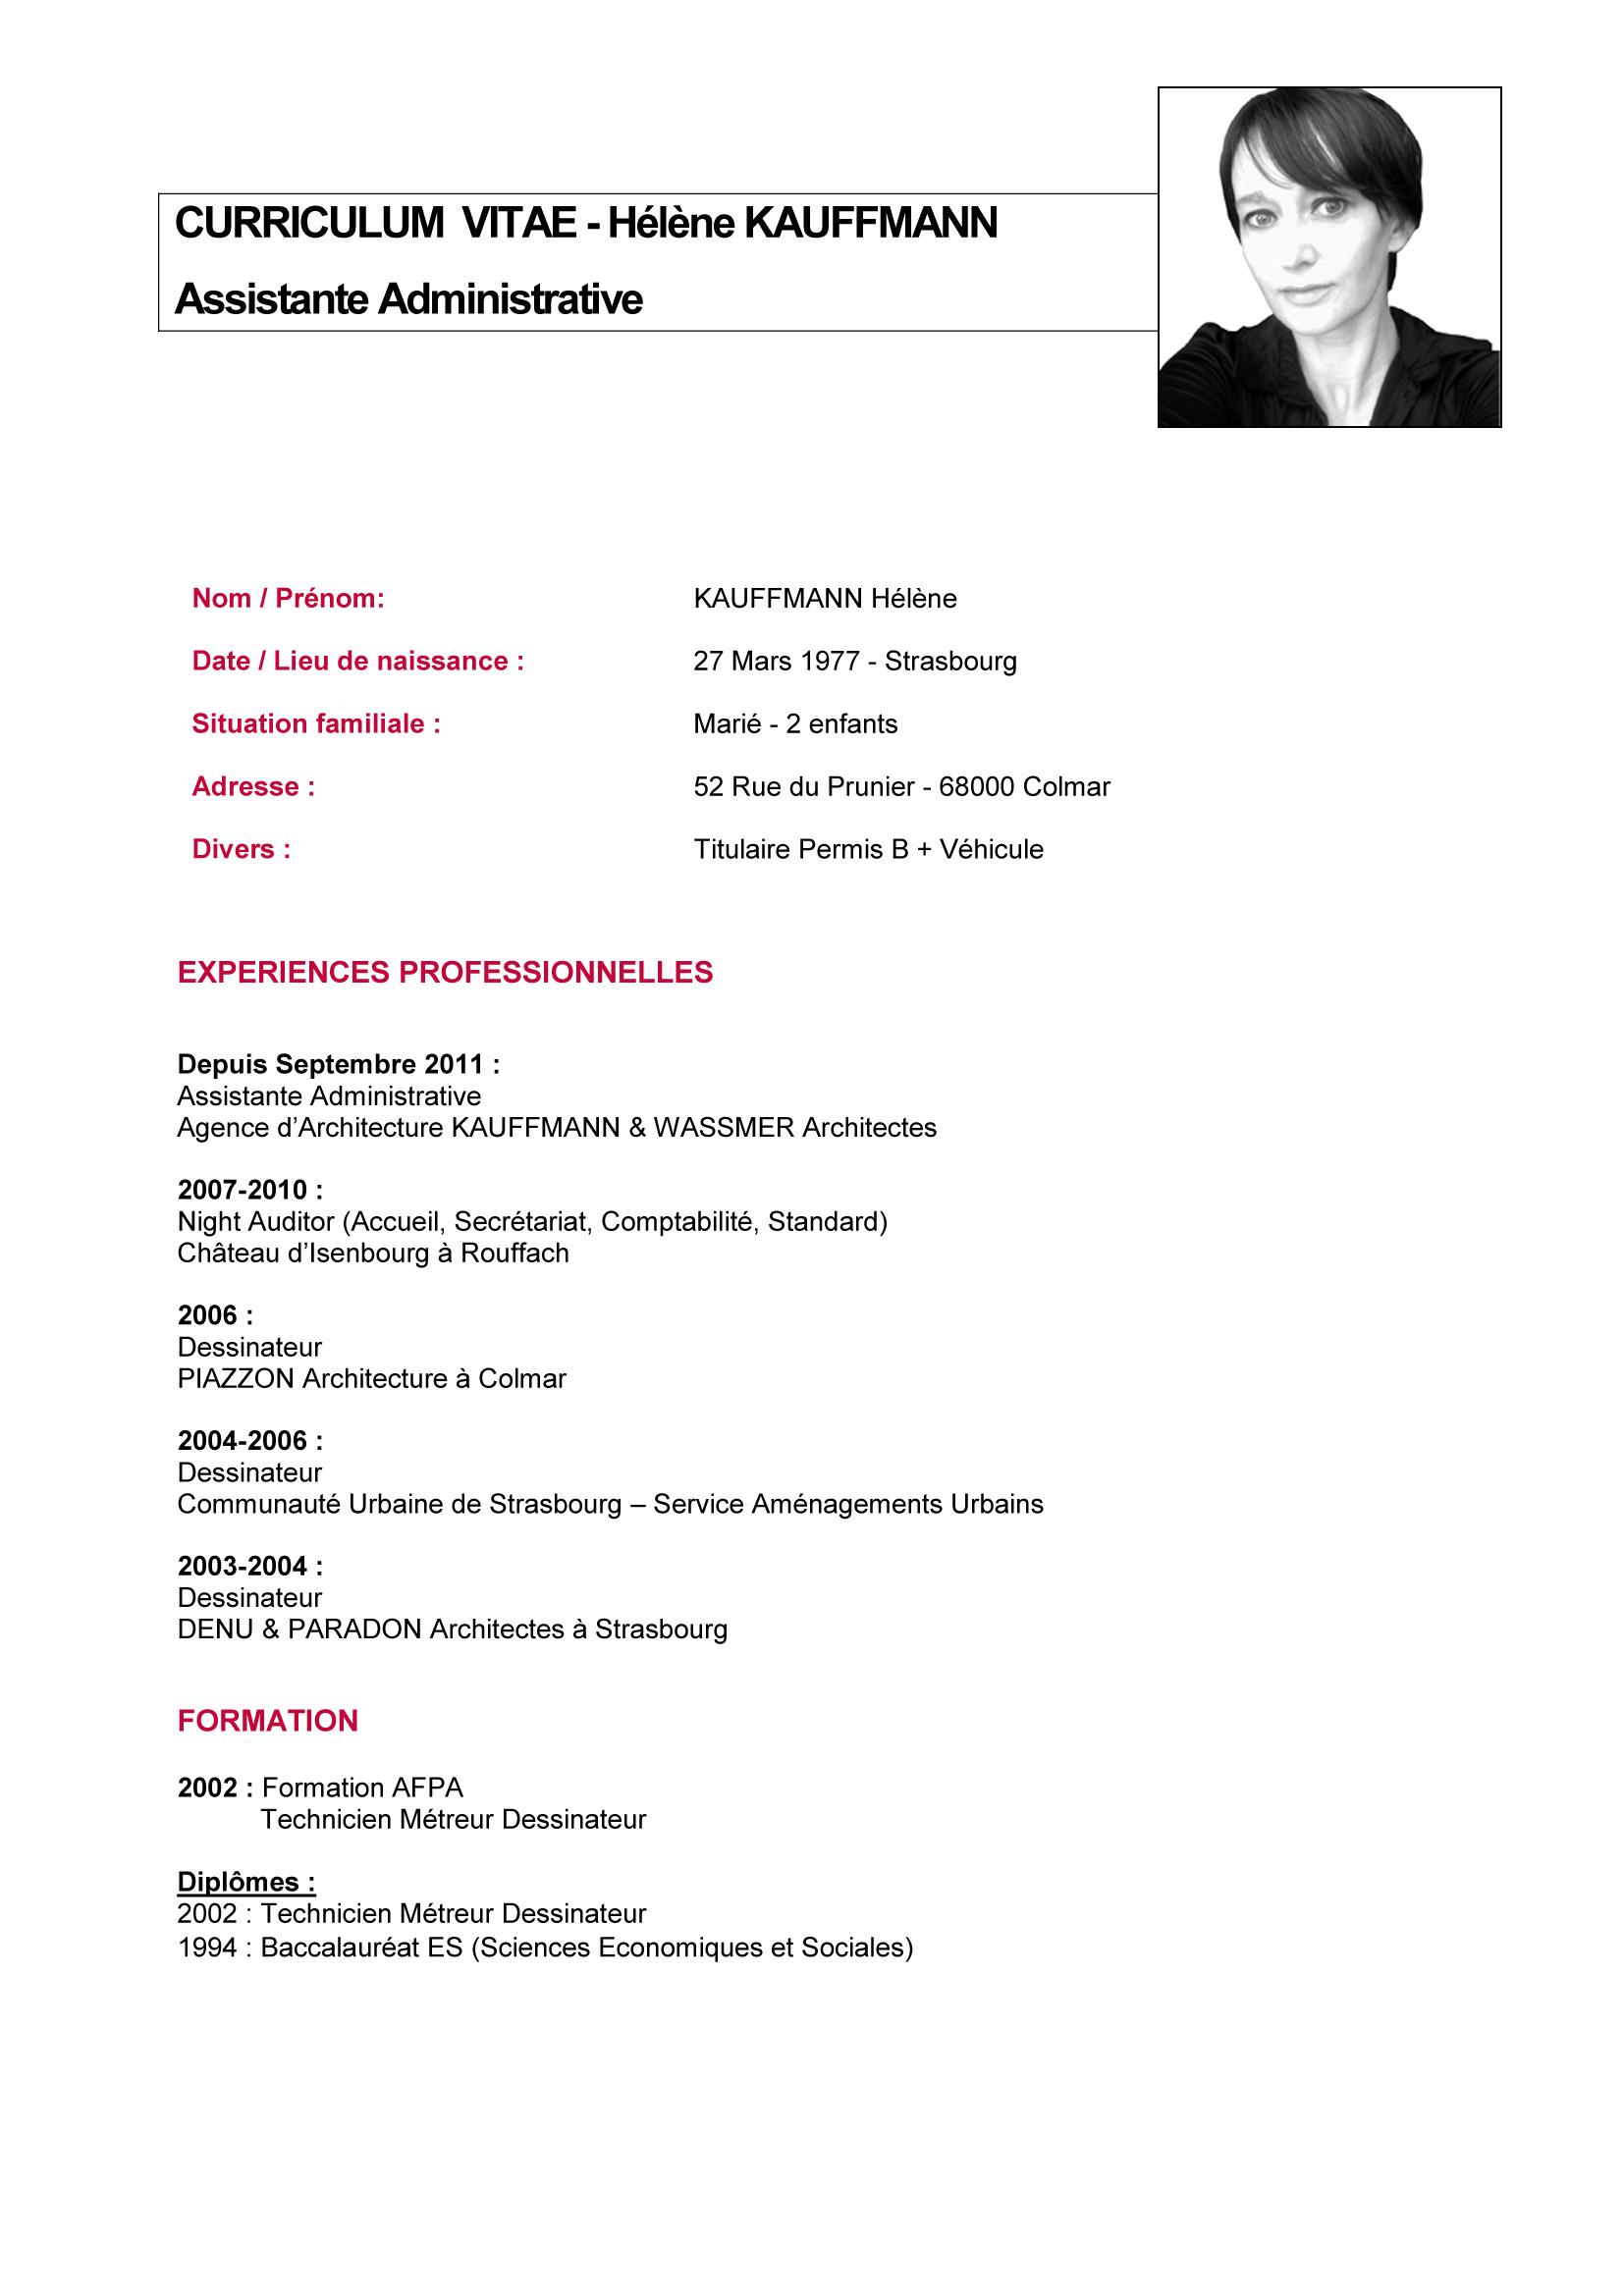 kauffmann et wassmer architectes  cabinet d u0026 39 architecture